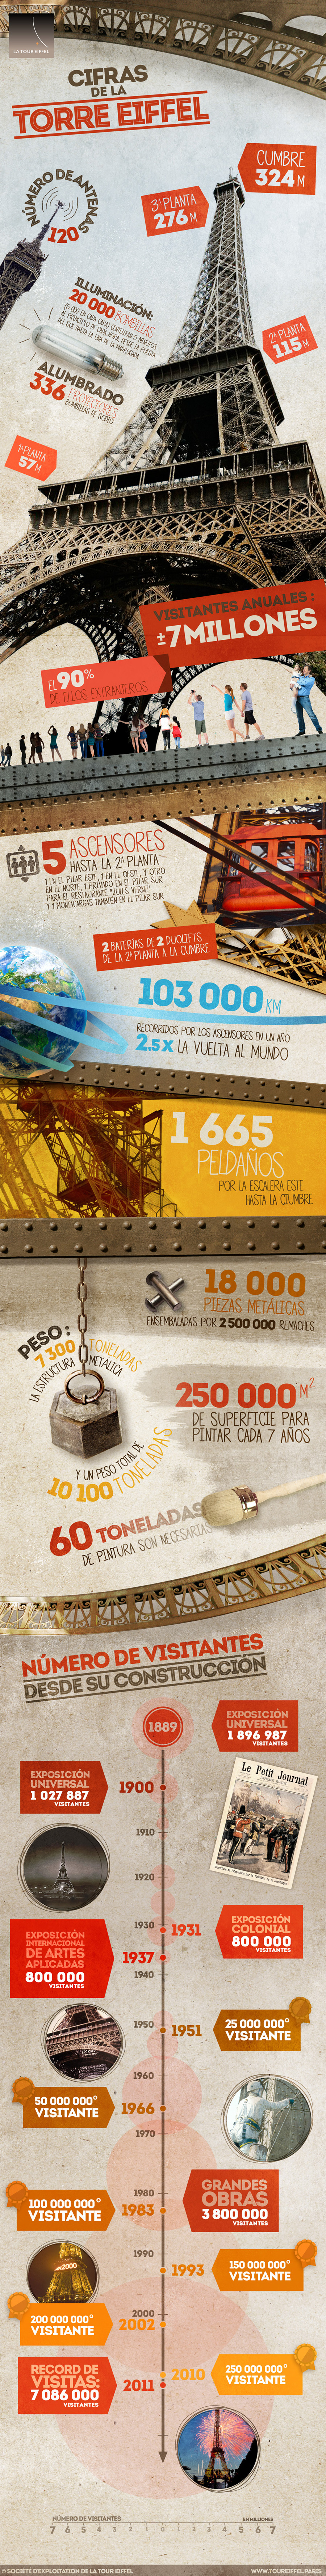 toureiffel-infographie_es